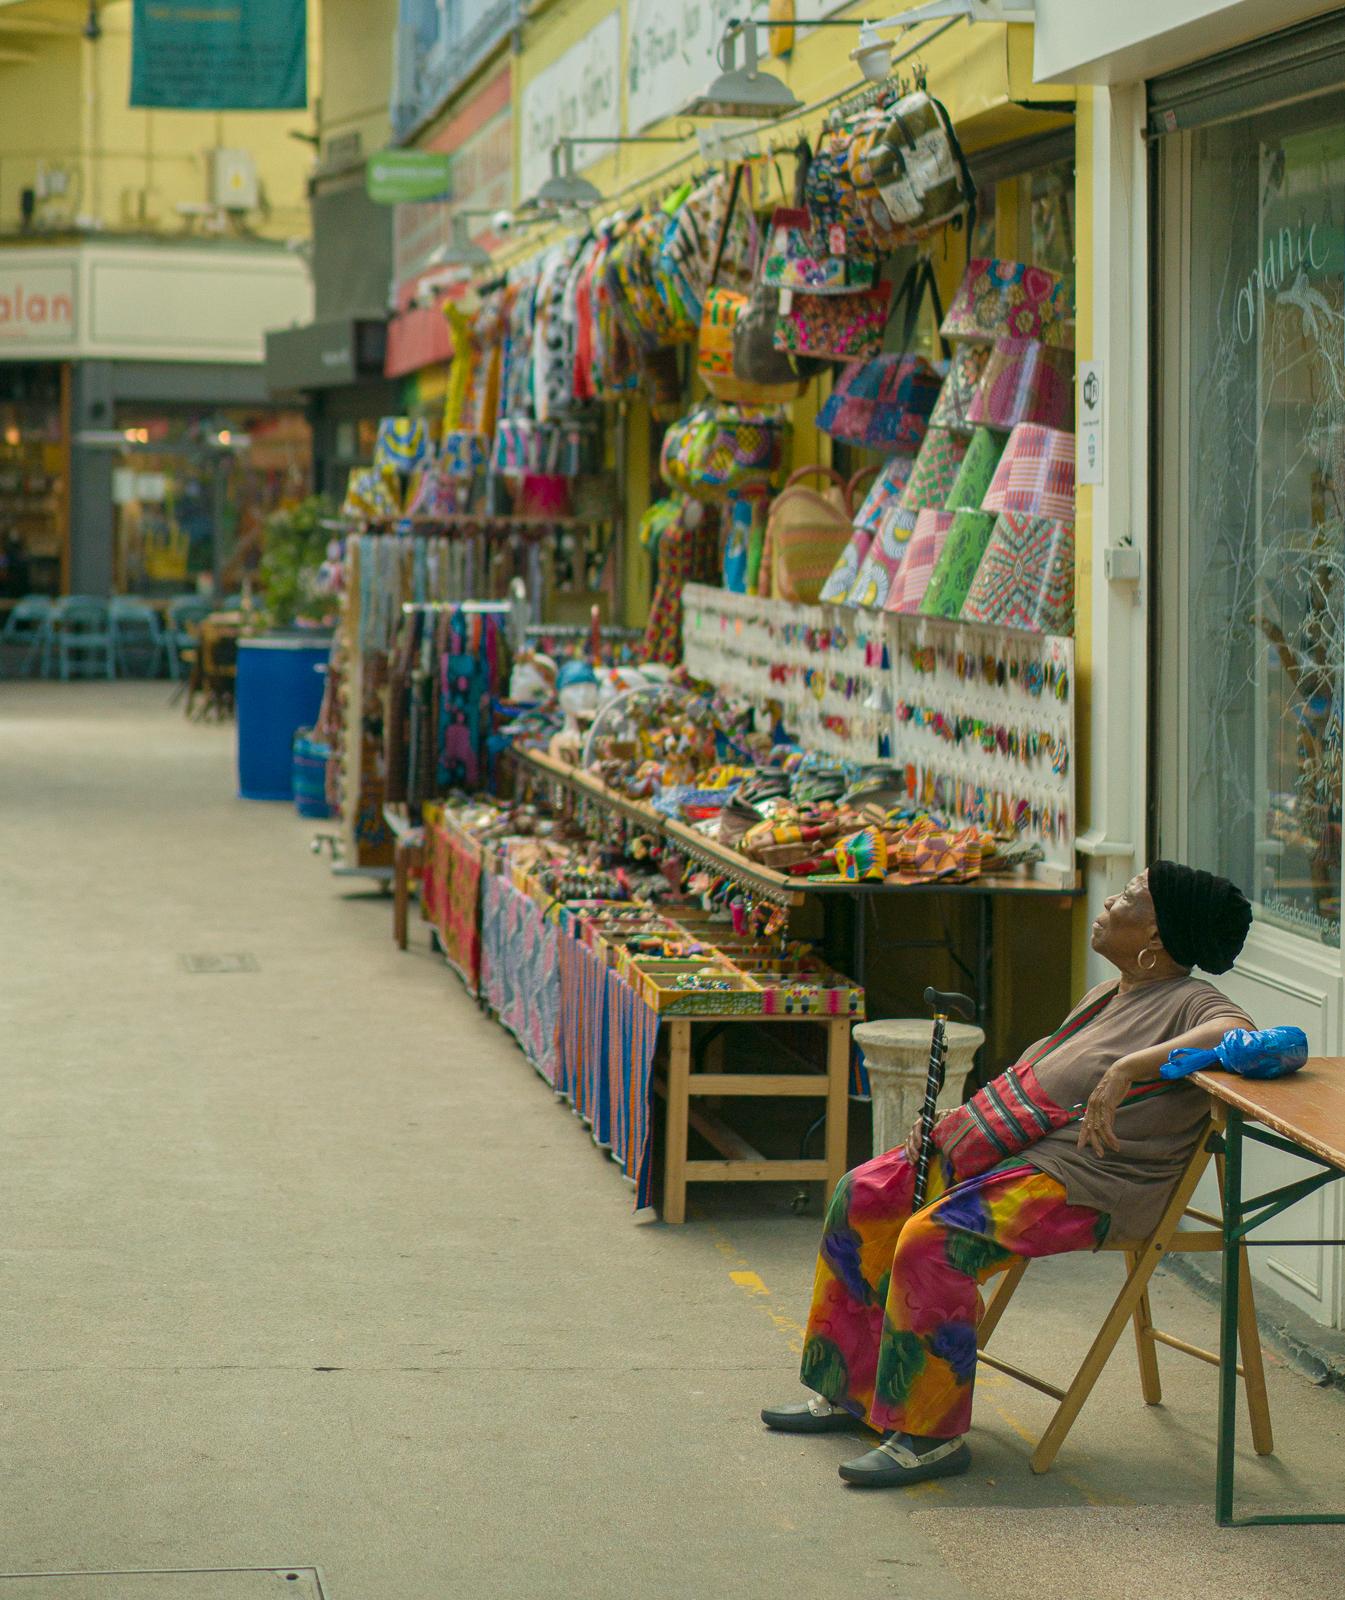 brixtonmarketjuly2019-1.jpg